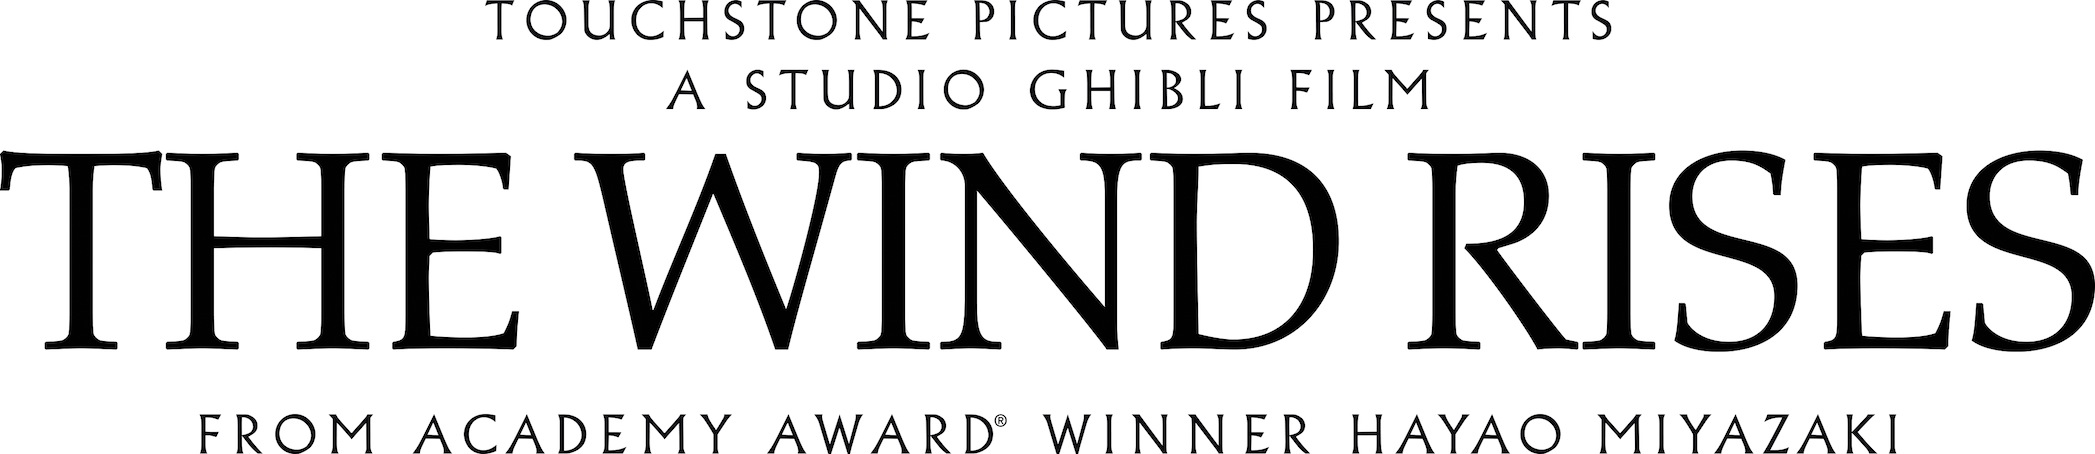 The Wind Rises Studio Ghibli Title Graphic